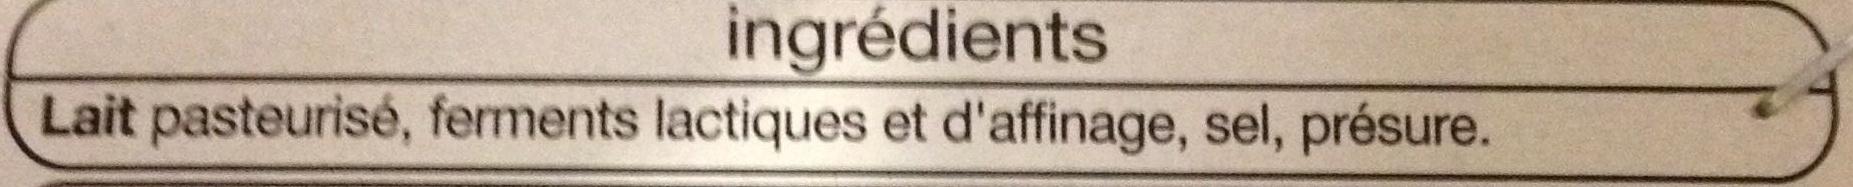 Camembert au lait pasteurisé 22 % MG - Ingrediënten